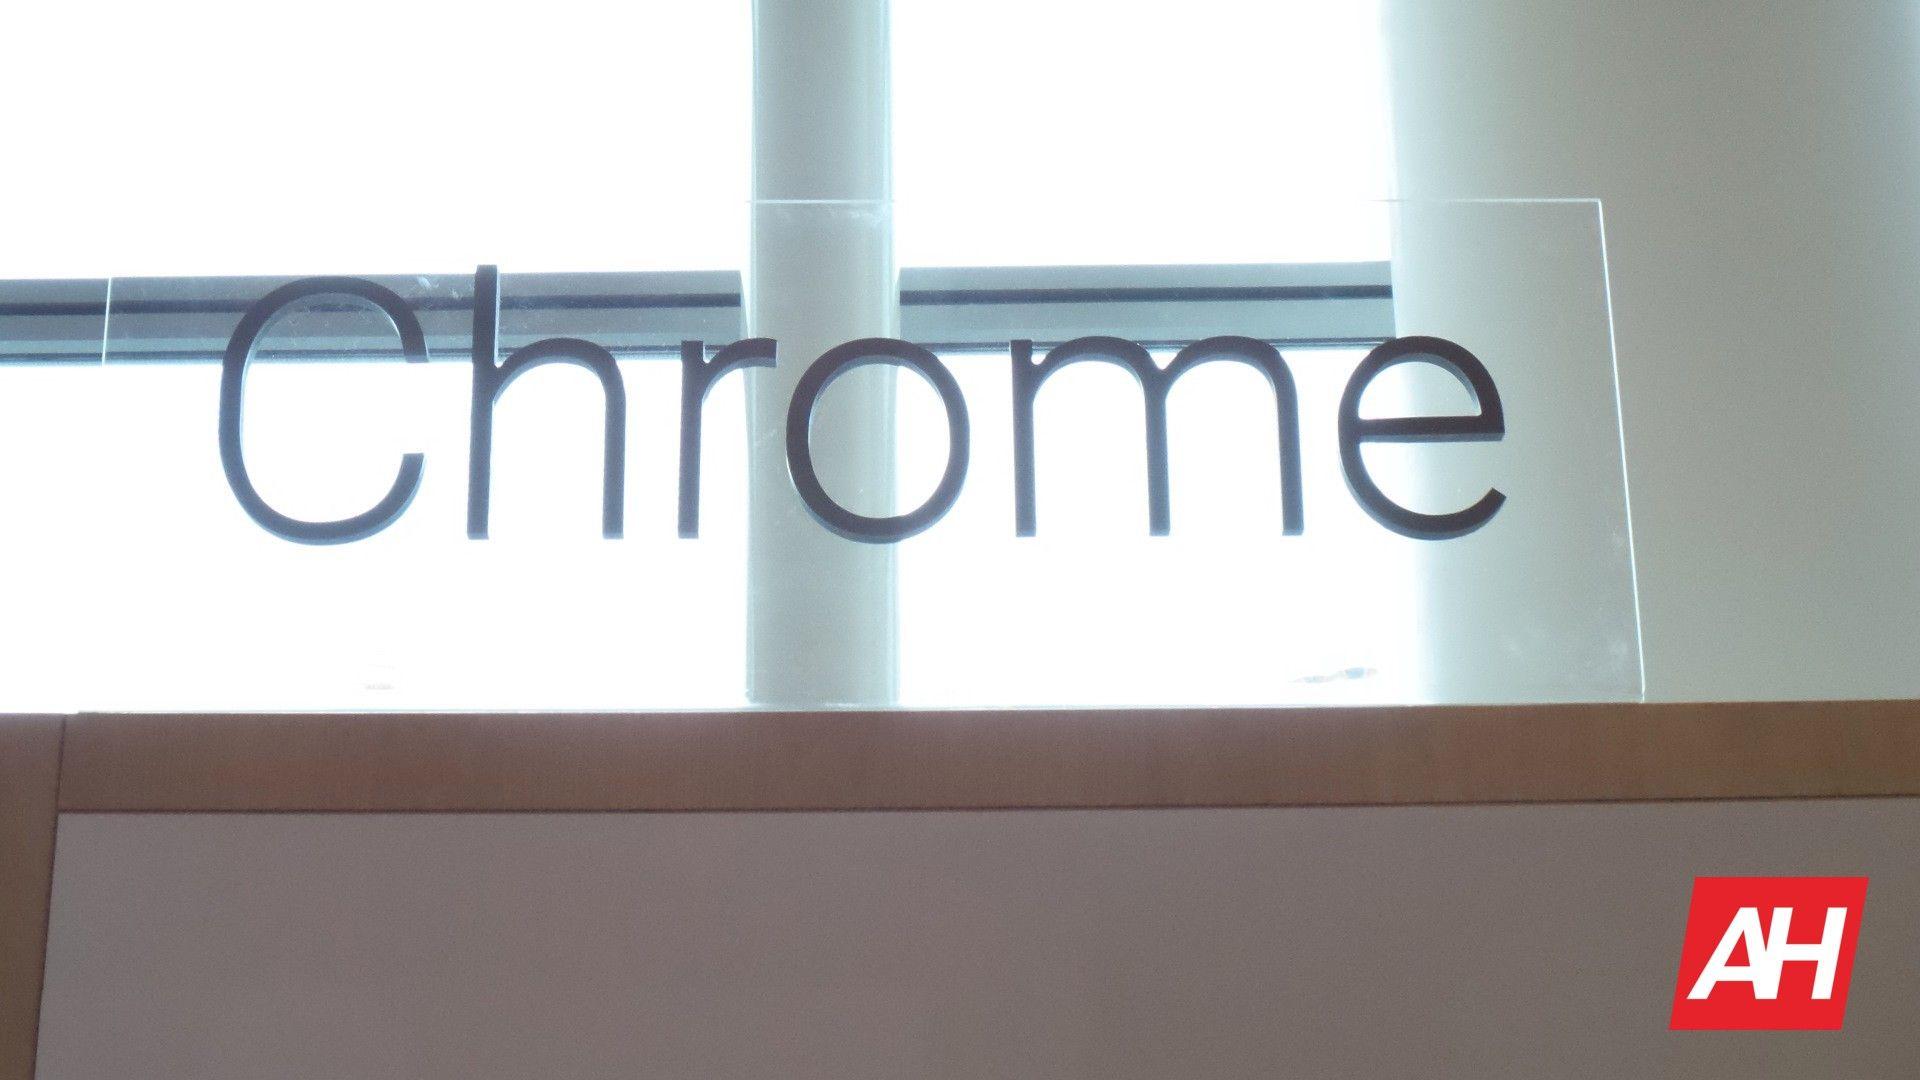 Microsoft & Google Bringing ARMReady Google Chrome To